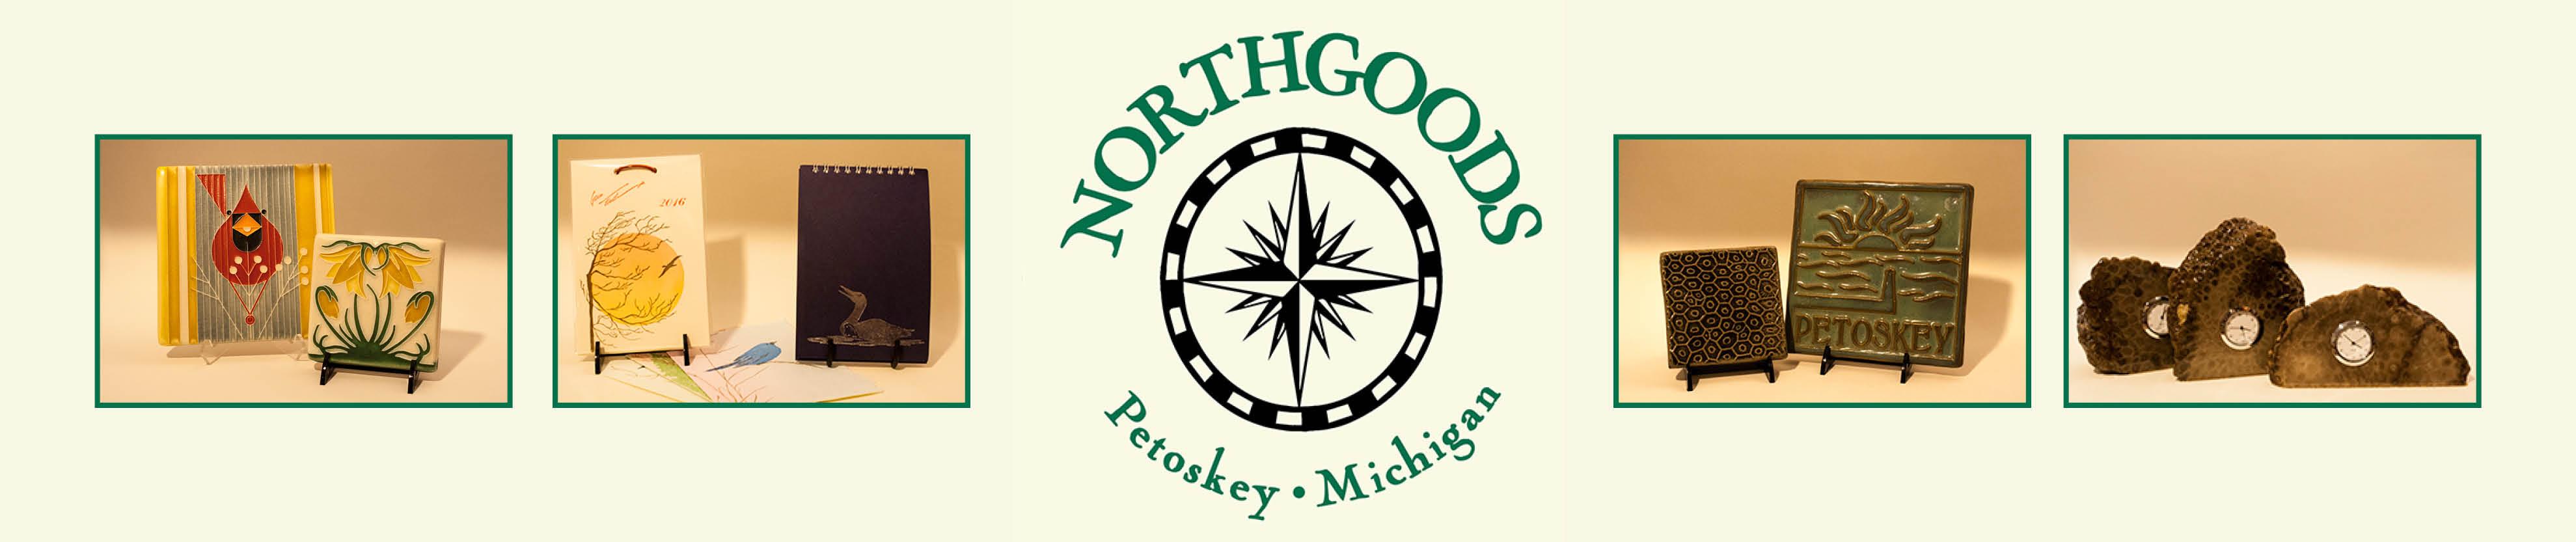 NorthGoods – Petoskey, MI